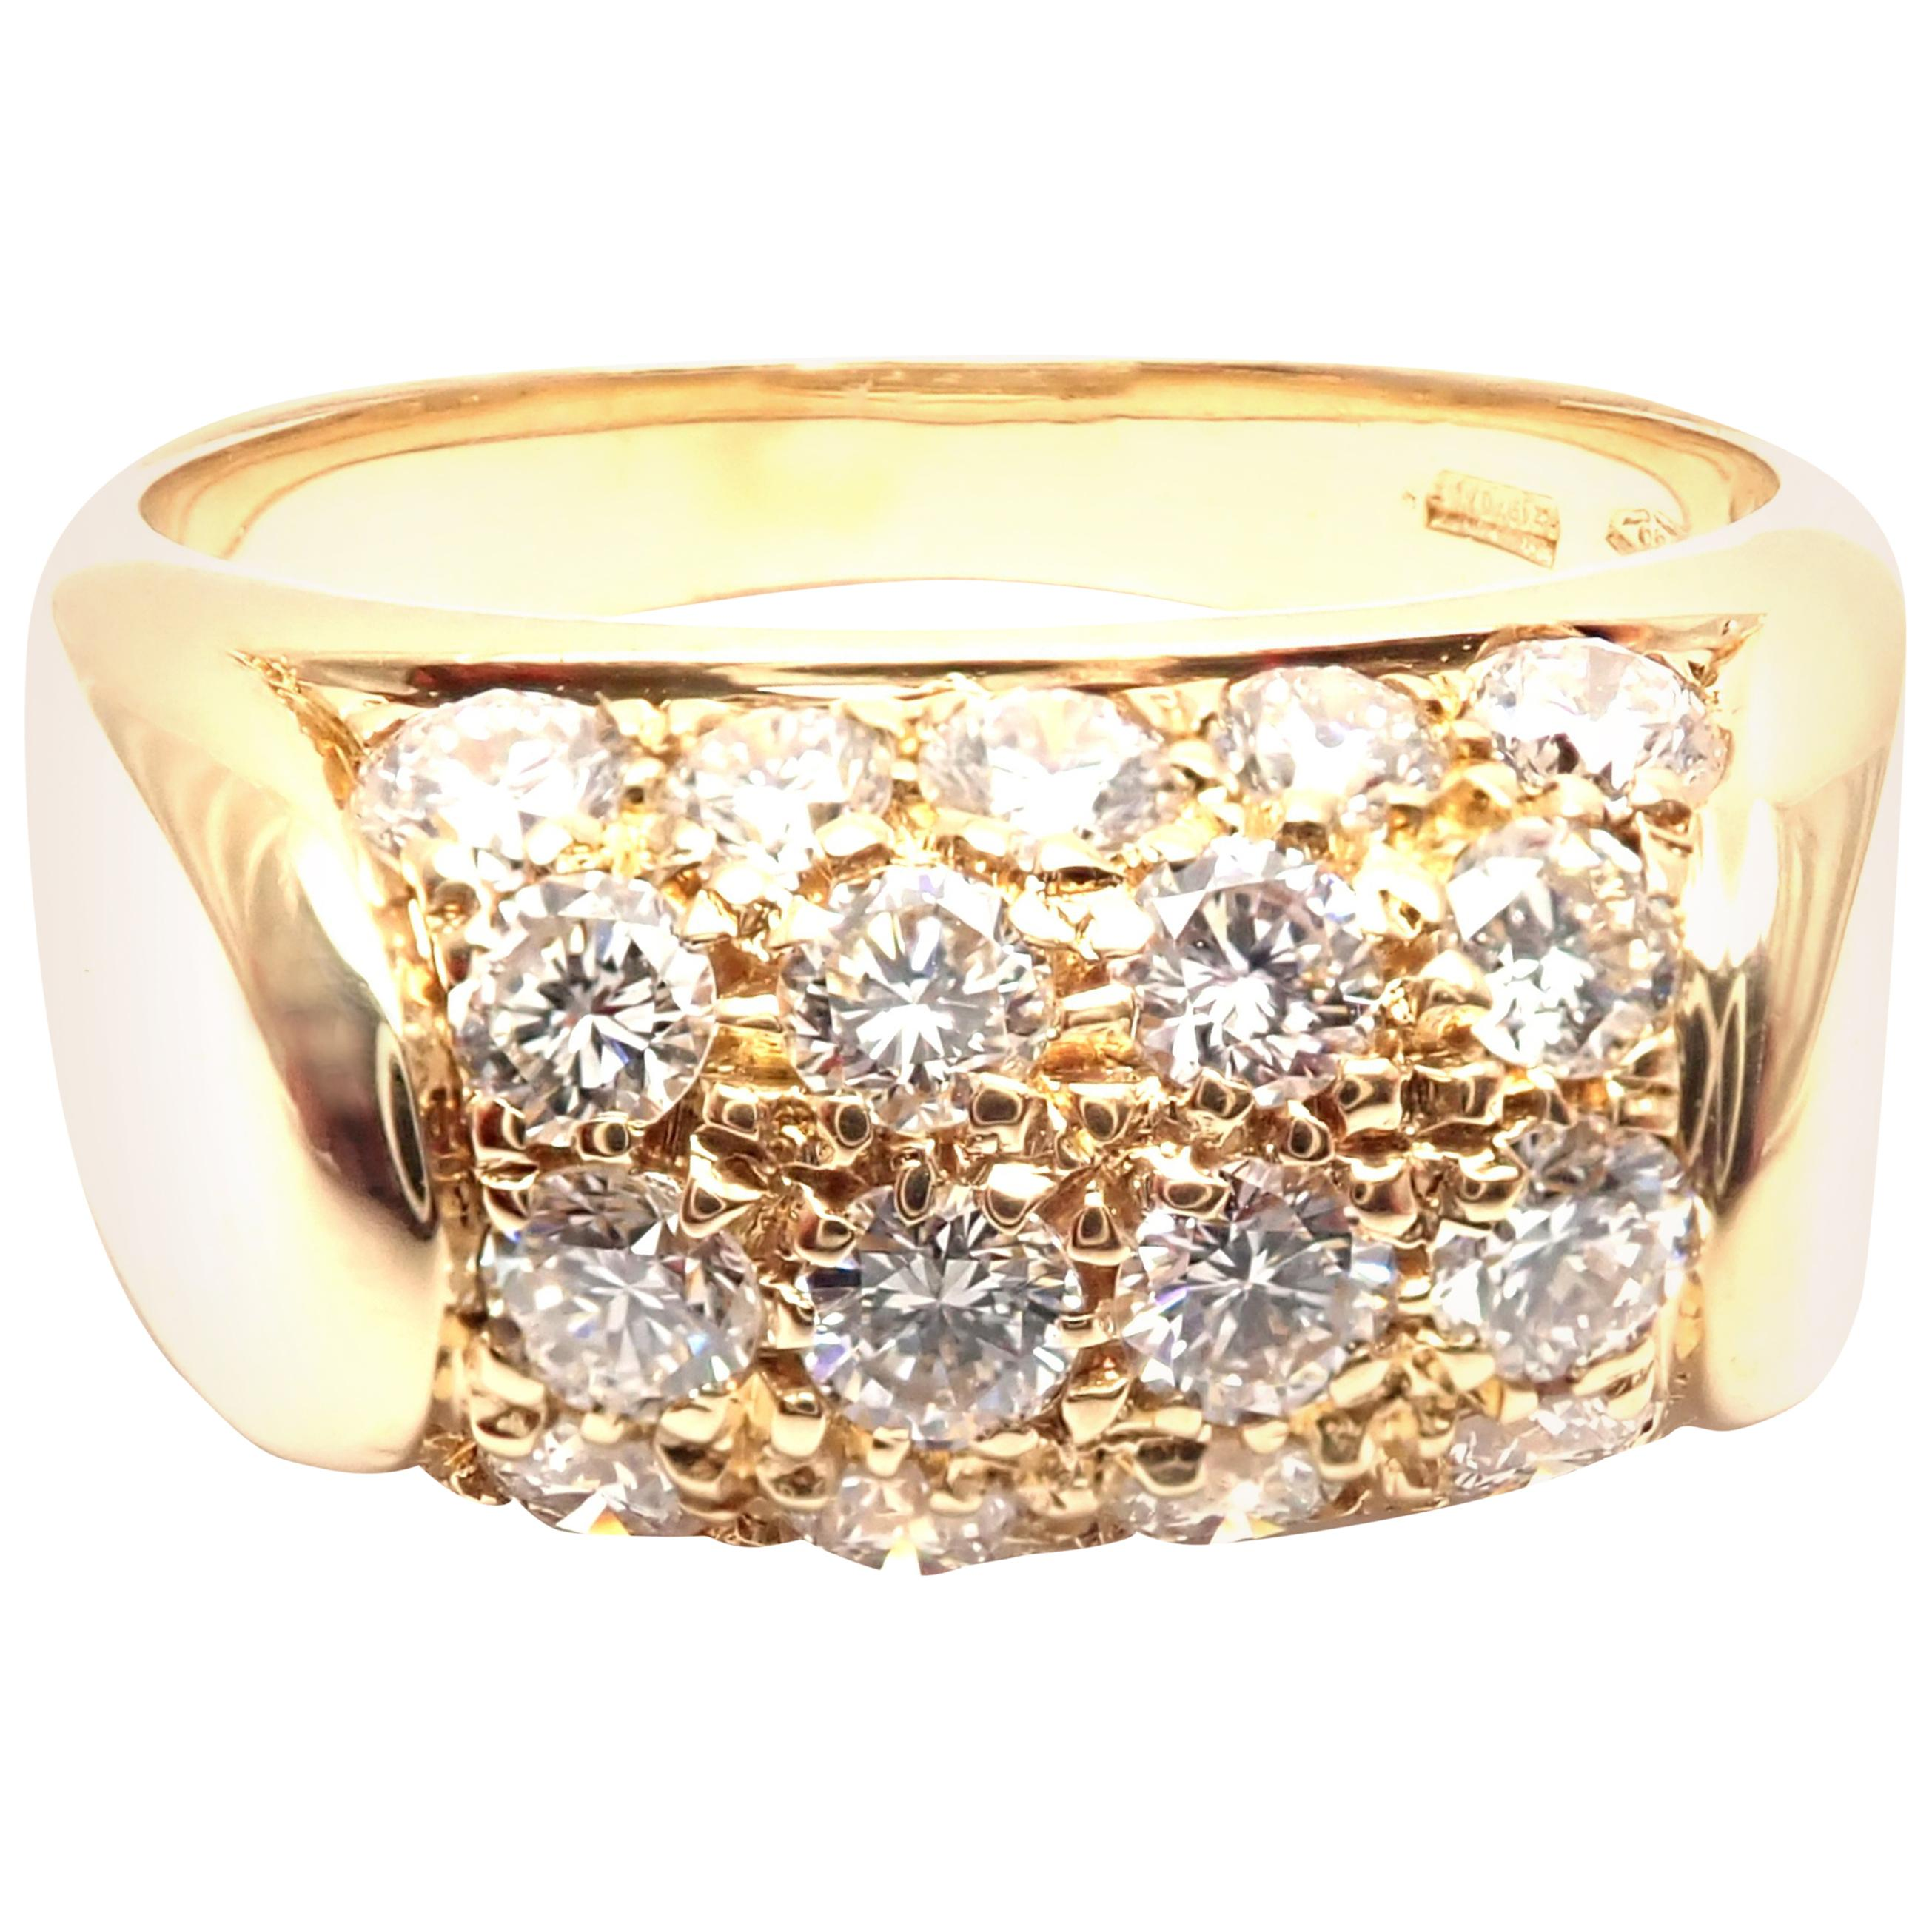 Bulgari Tronchetto Diamond Yellow Gold Band Ring